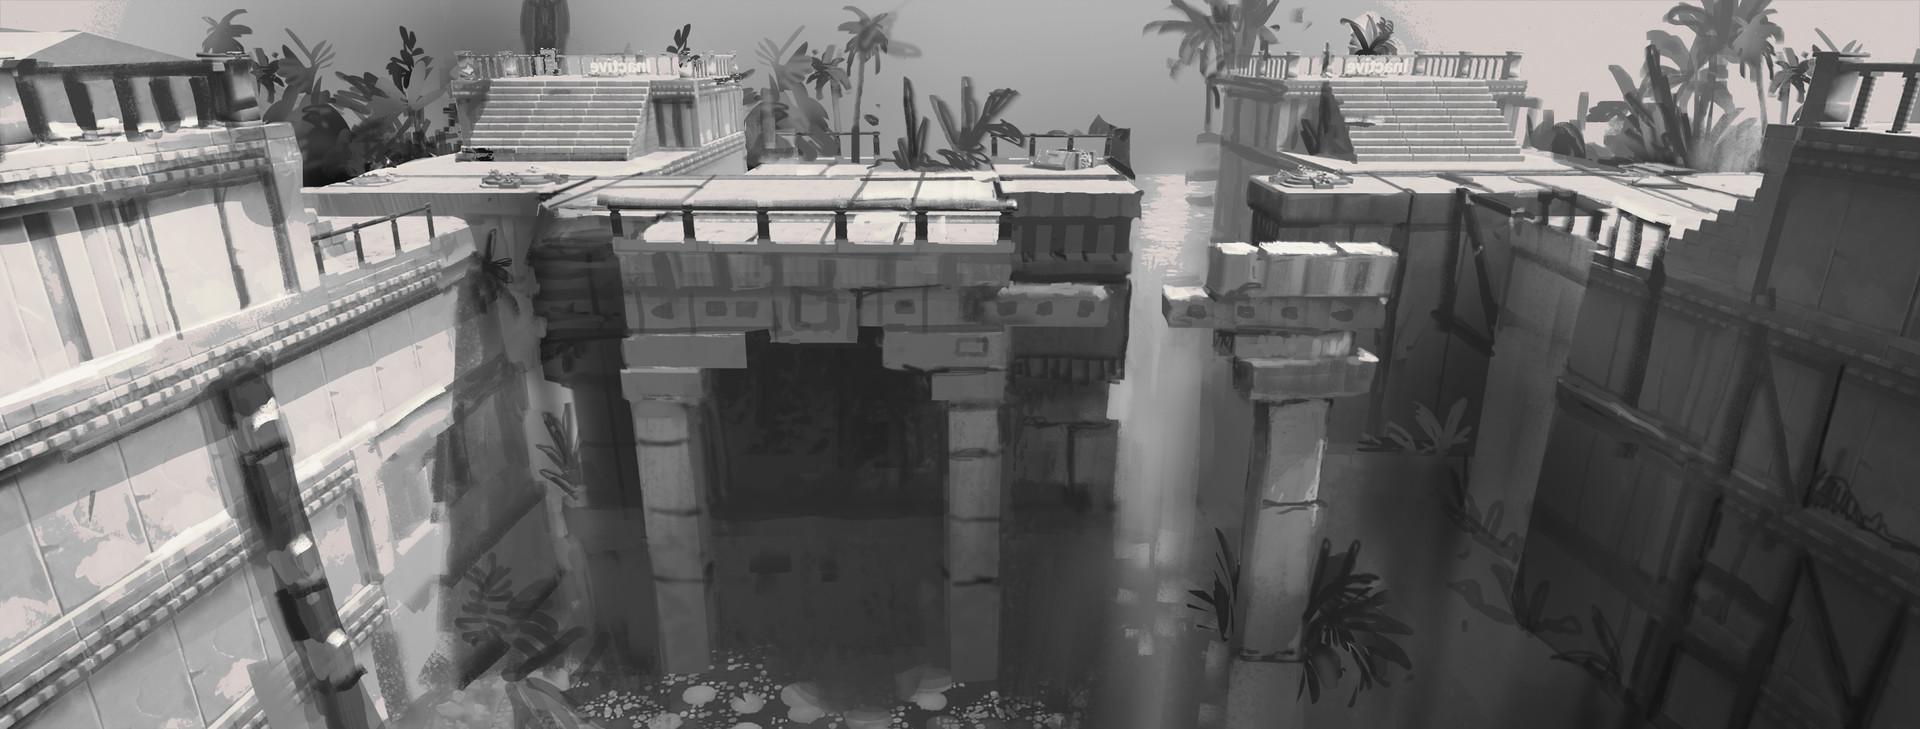 Adrien girod env bridge level02